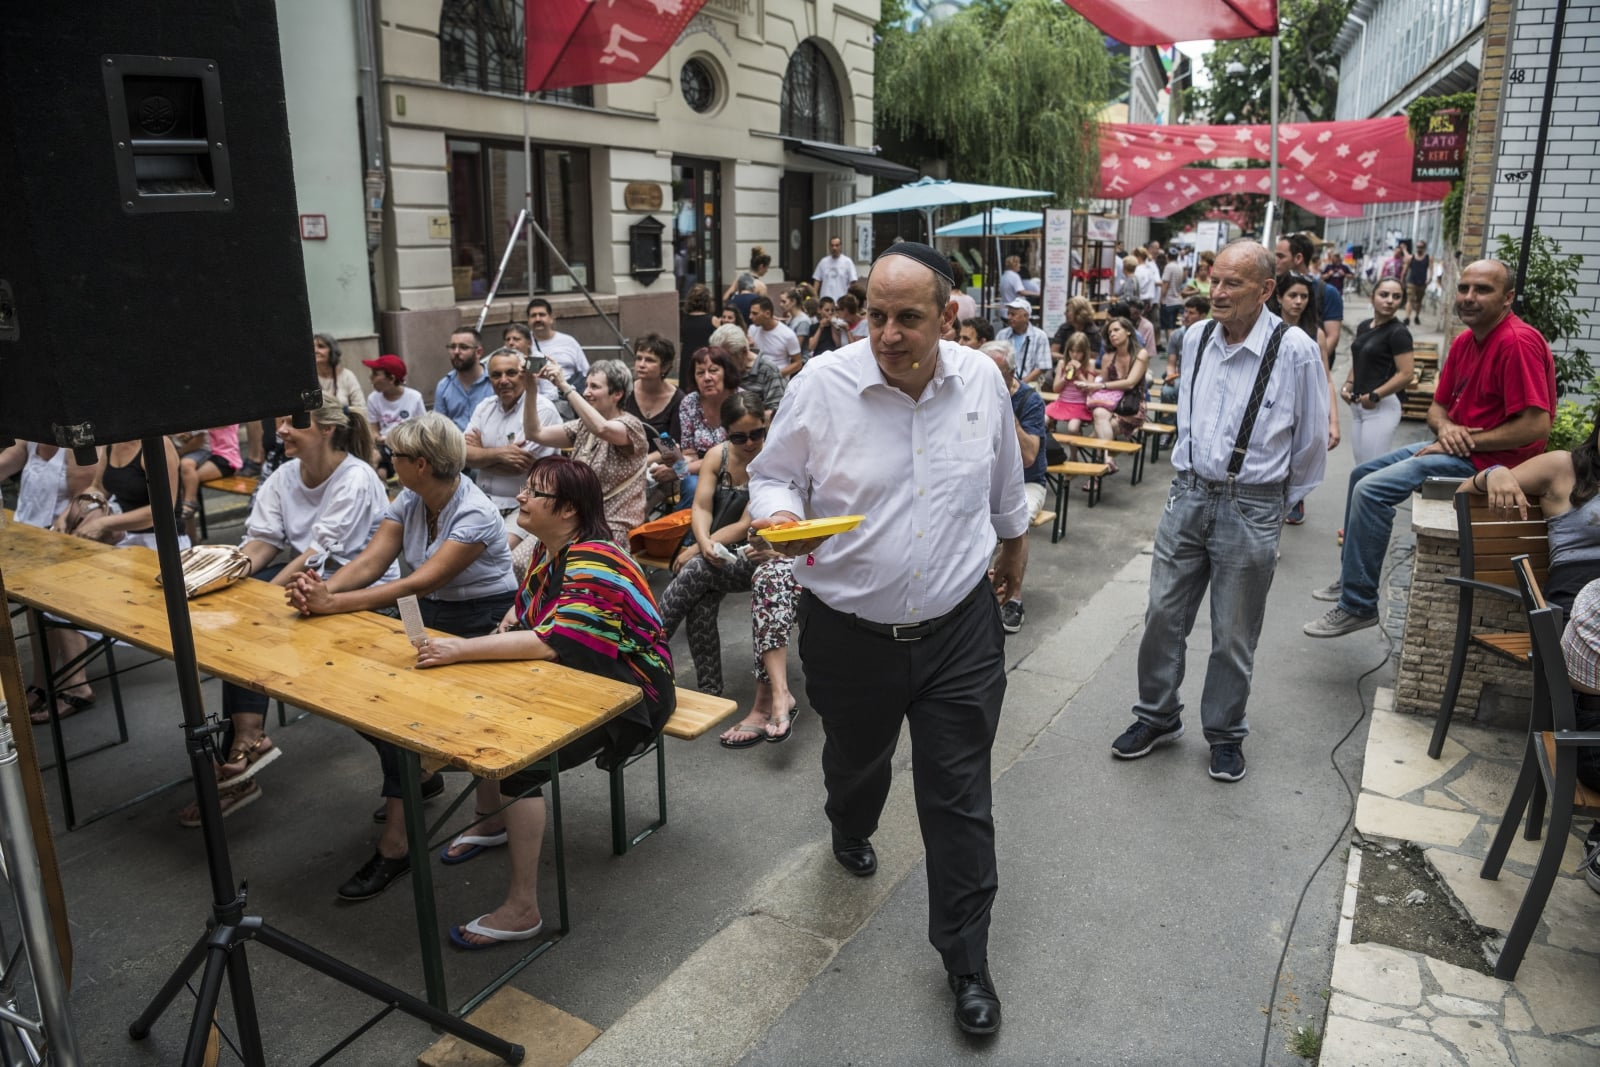 Judafest w Budapeszcie fot. EPA/Marton Monus HUNGARY OUT Dostawca: PAP/EPA.